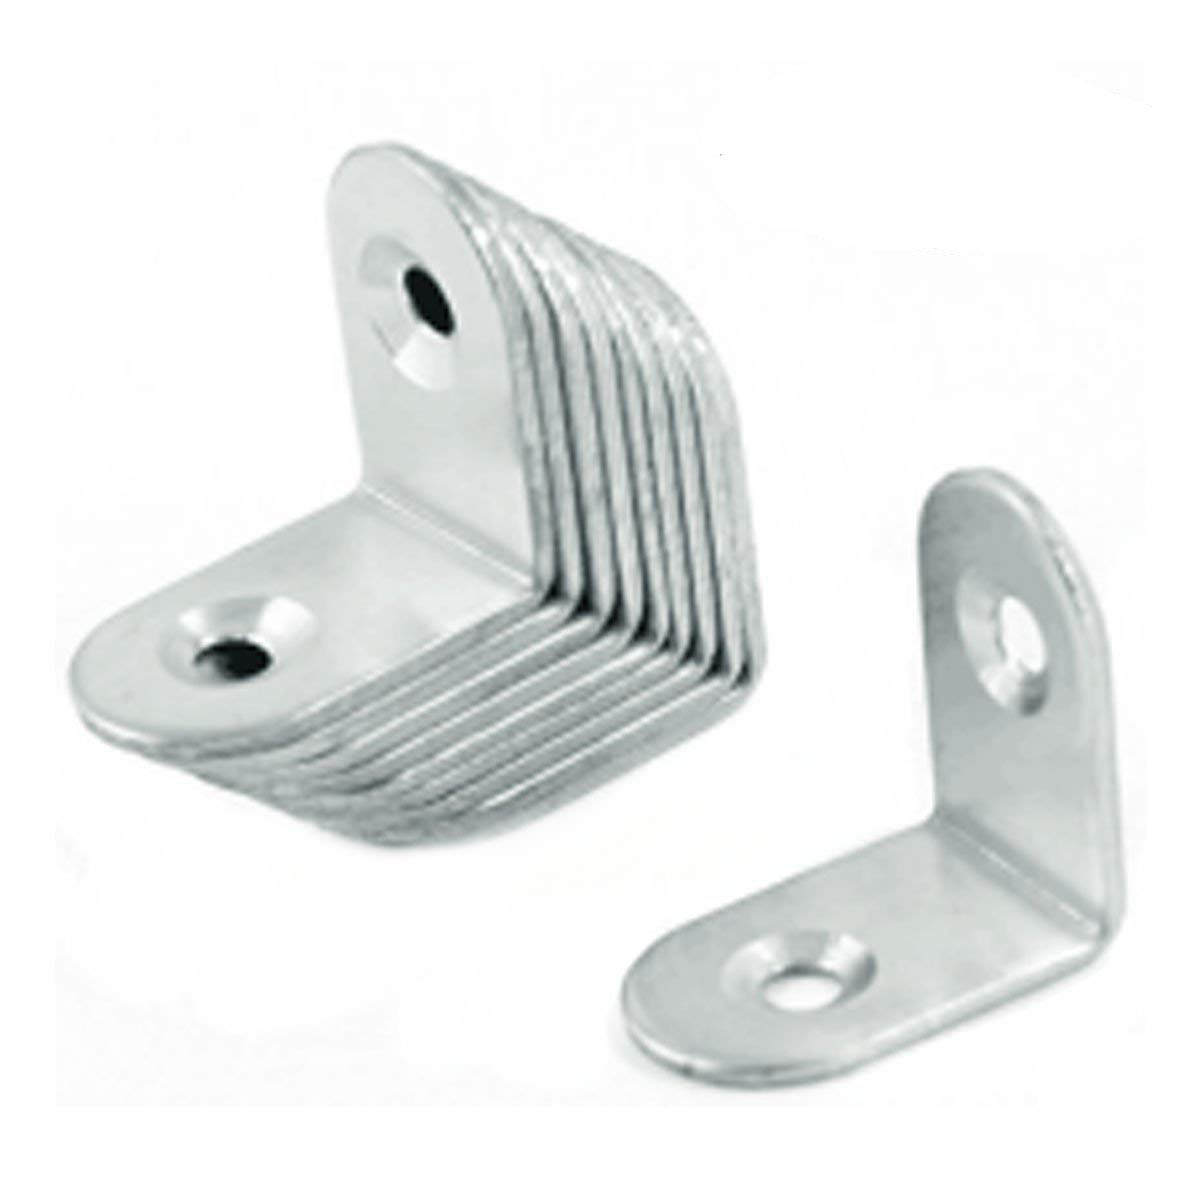 URBEST 10 Pcs 25mm x 25mm L Shape Stainless Steel Corner Brace Joint Right Angle Bracket